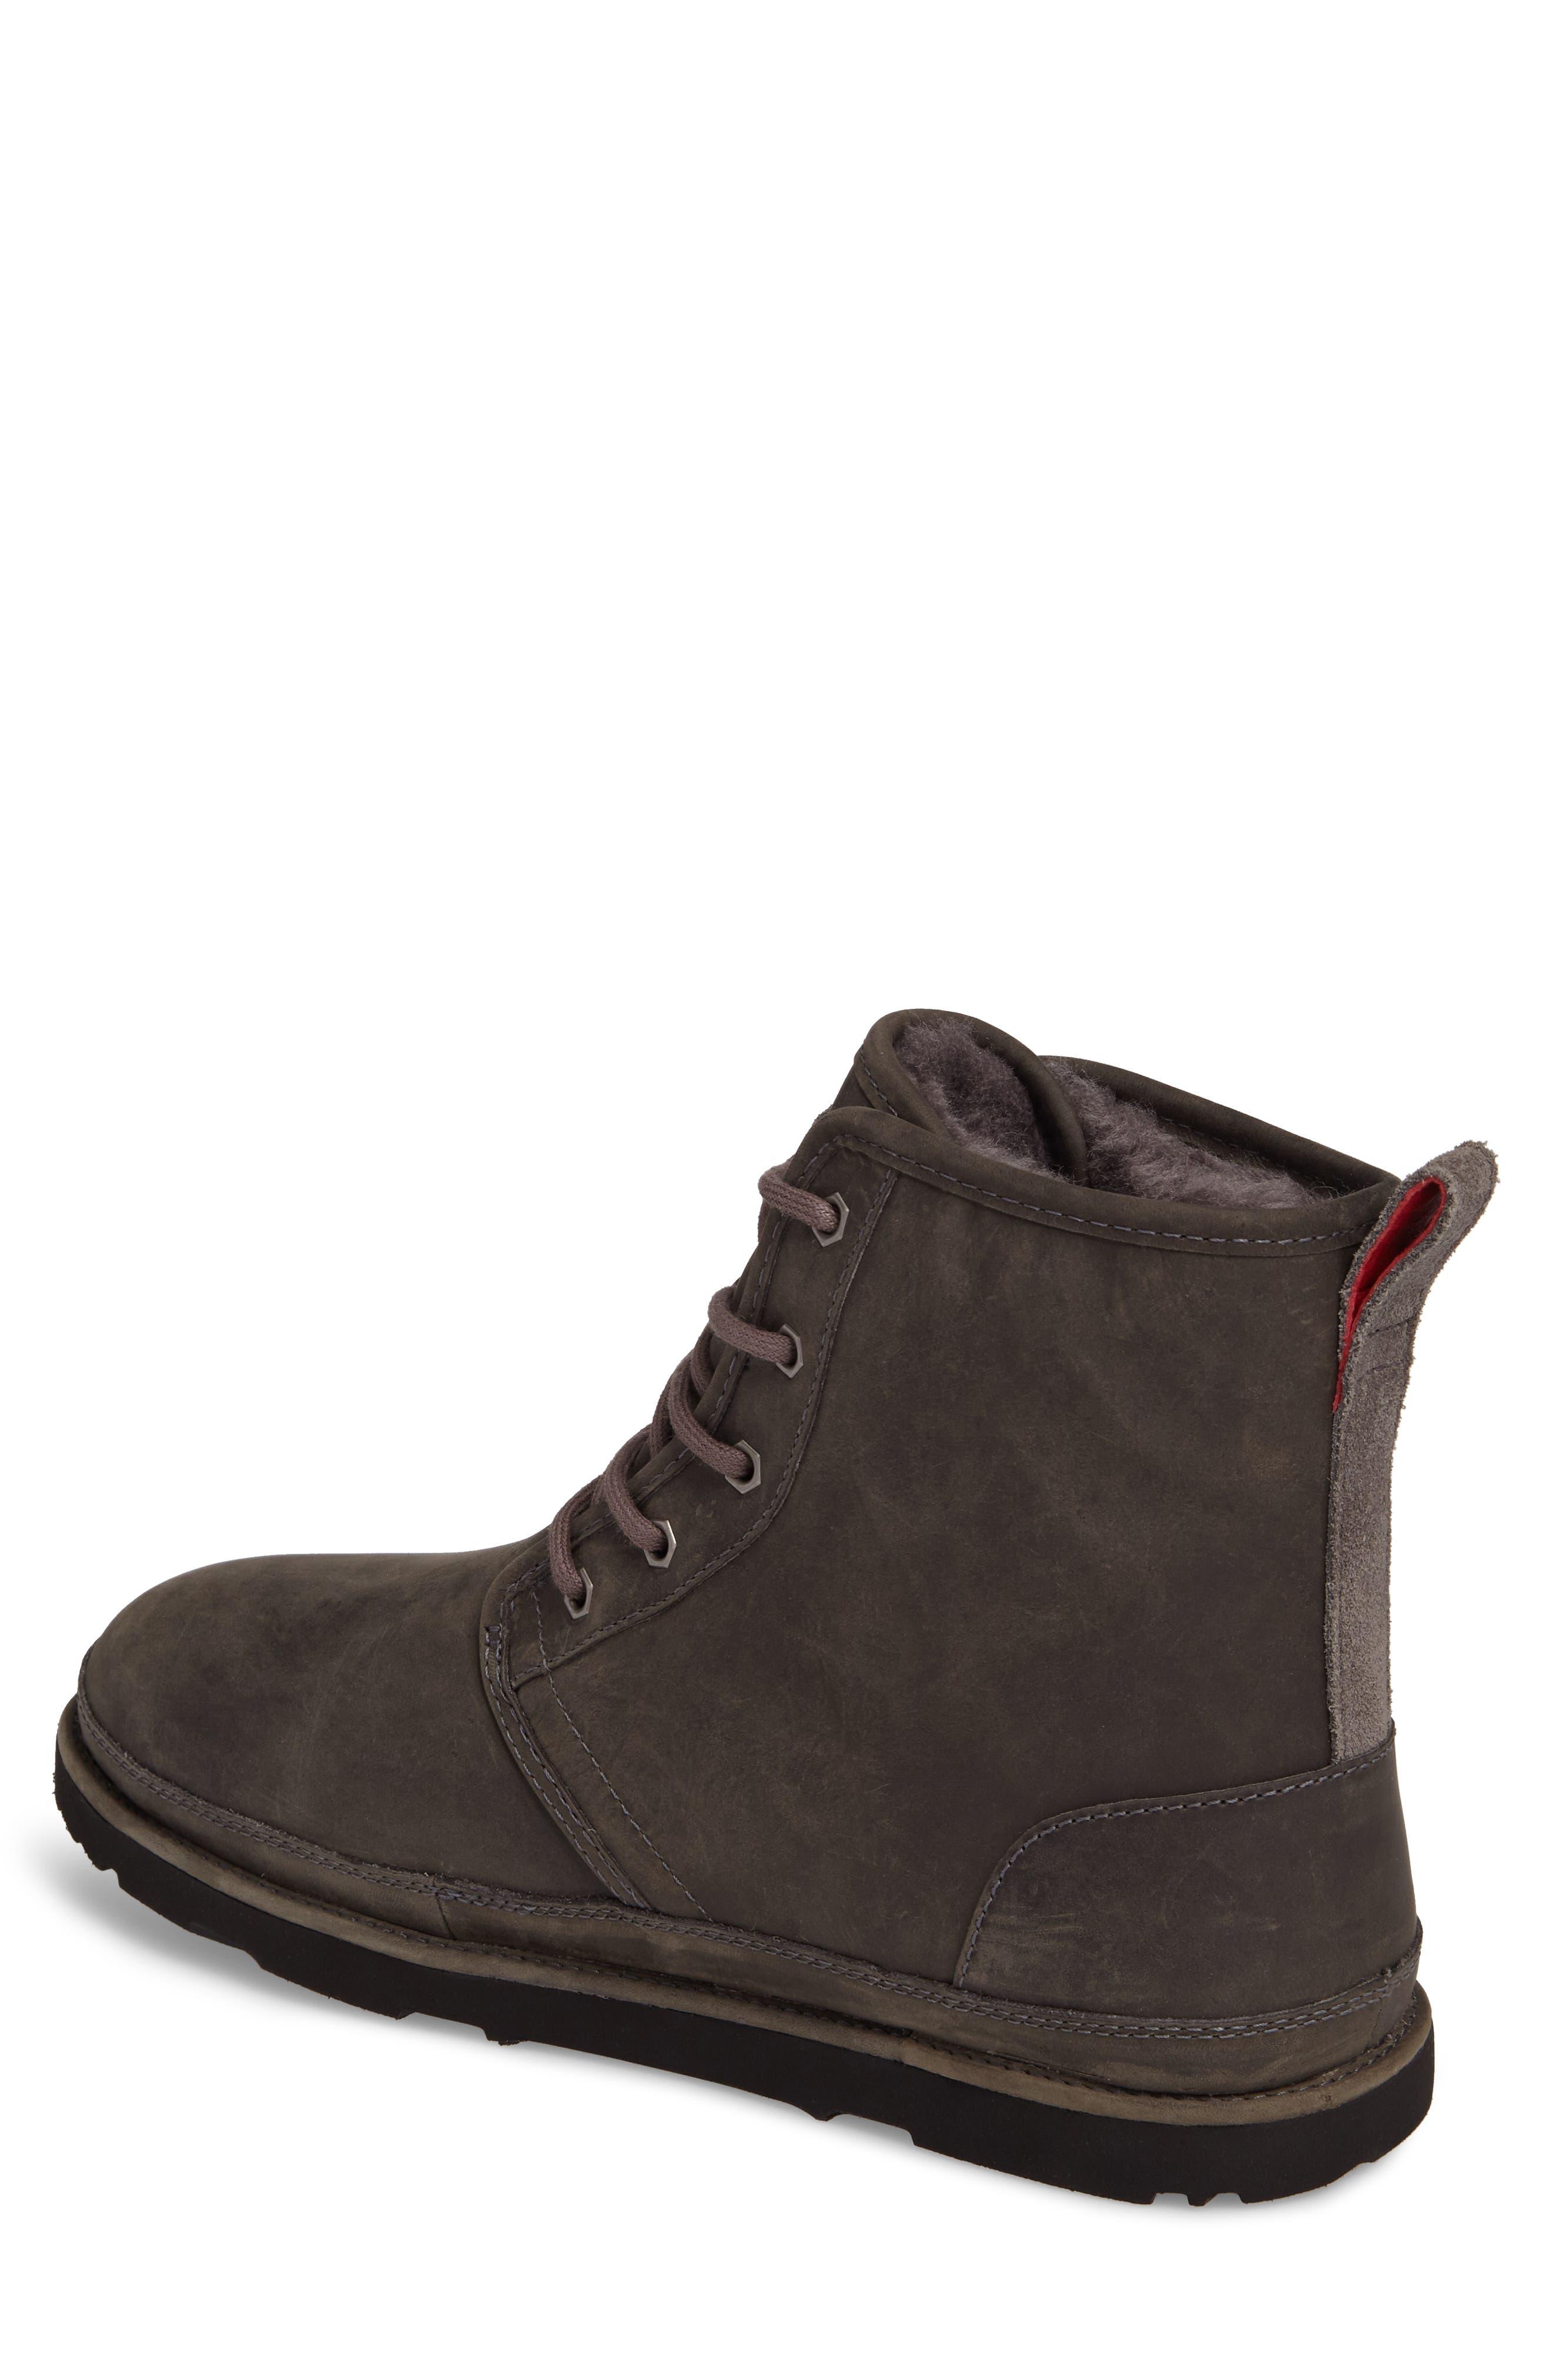 ,                             Harkley Plain Toe Waterproof Waterproof Boot,                             Alternate thumbnail 2, color,                             CHARCOAL